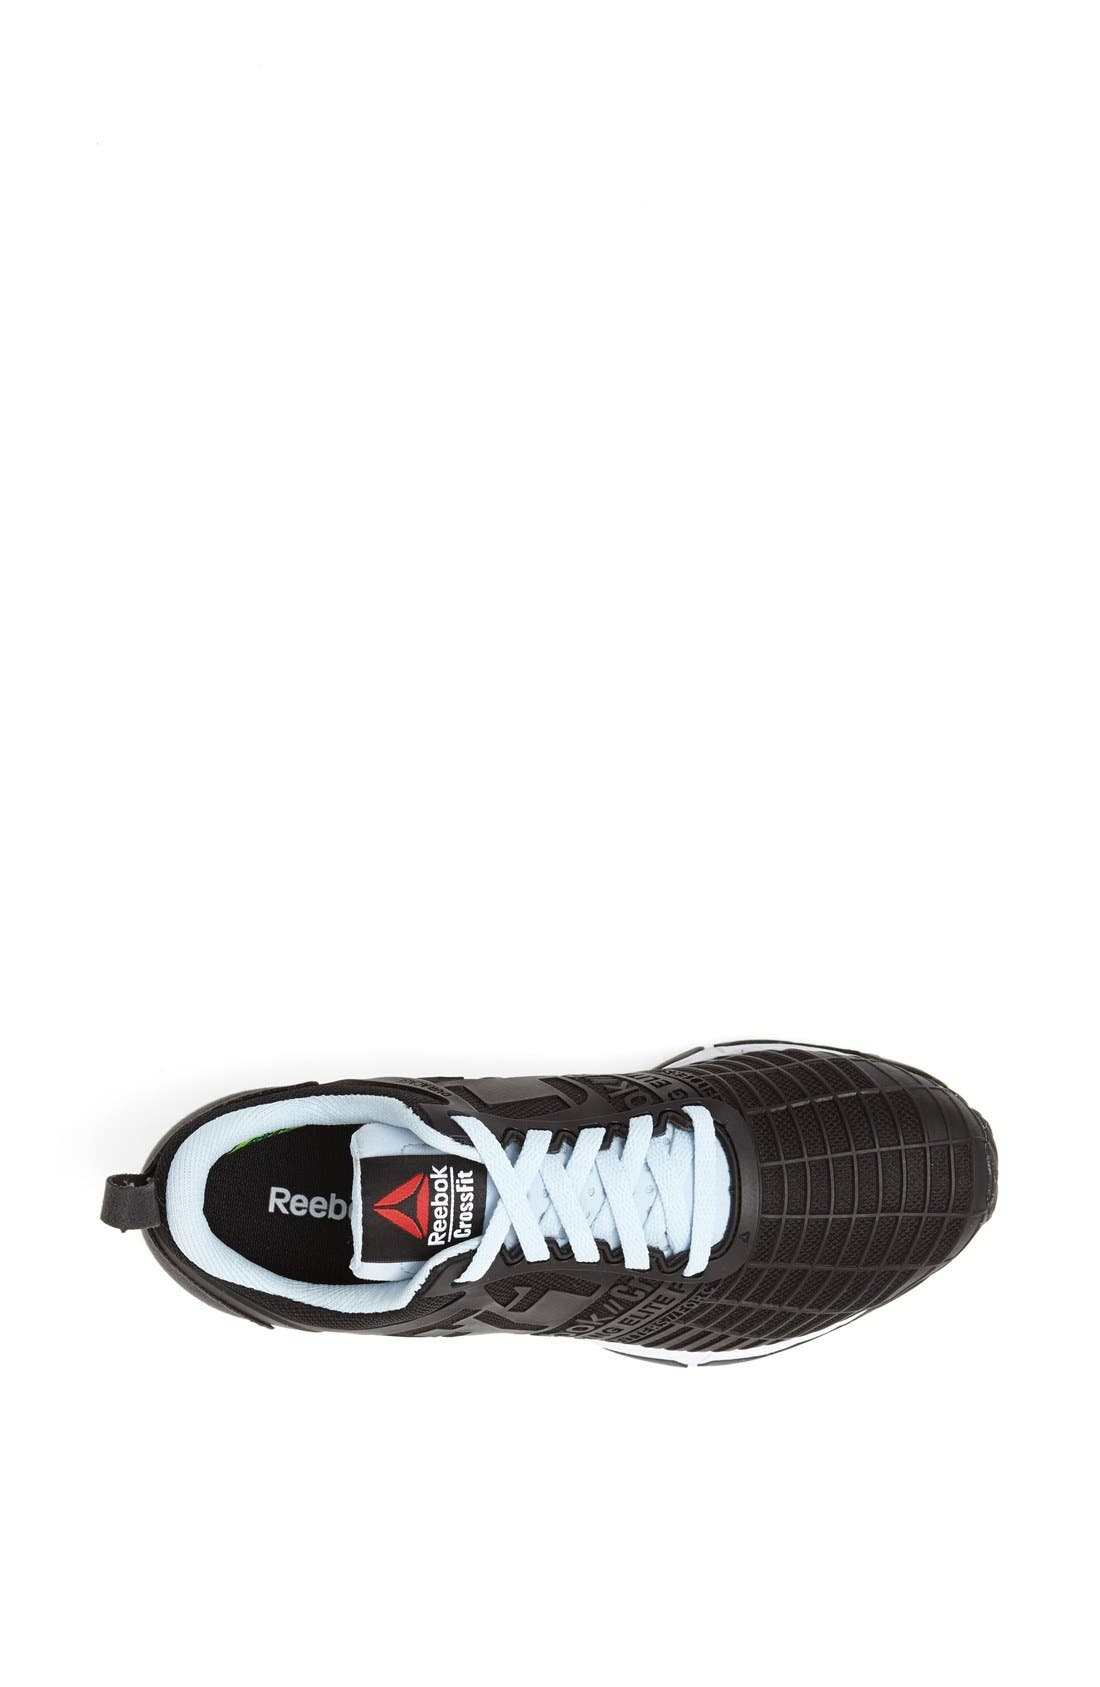 Alternate Image 3  - Reebok 'Crossfit Sprint' Training Shoe (Women)